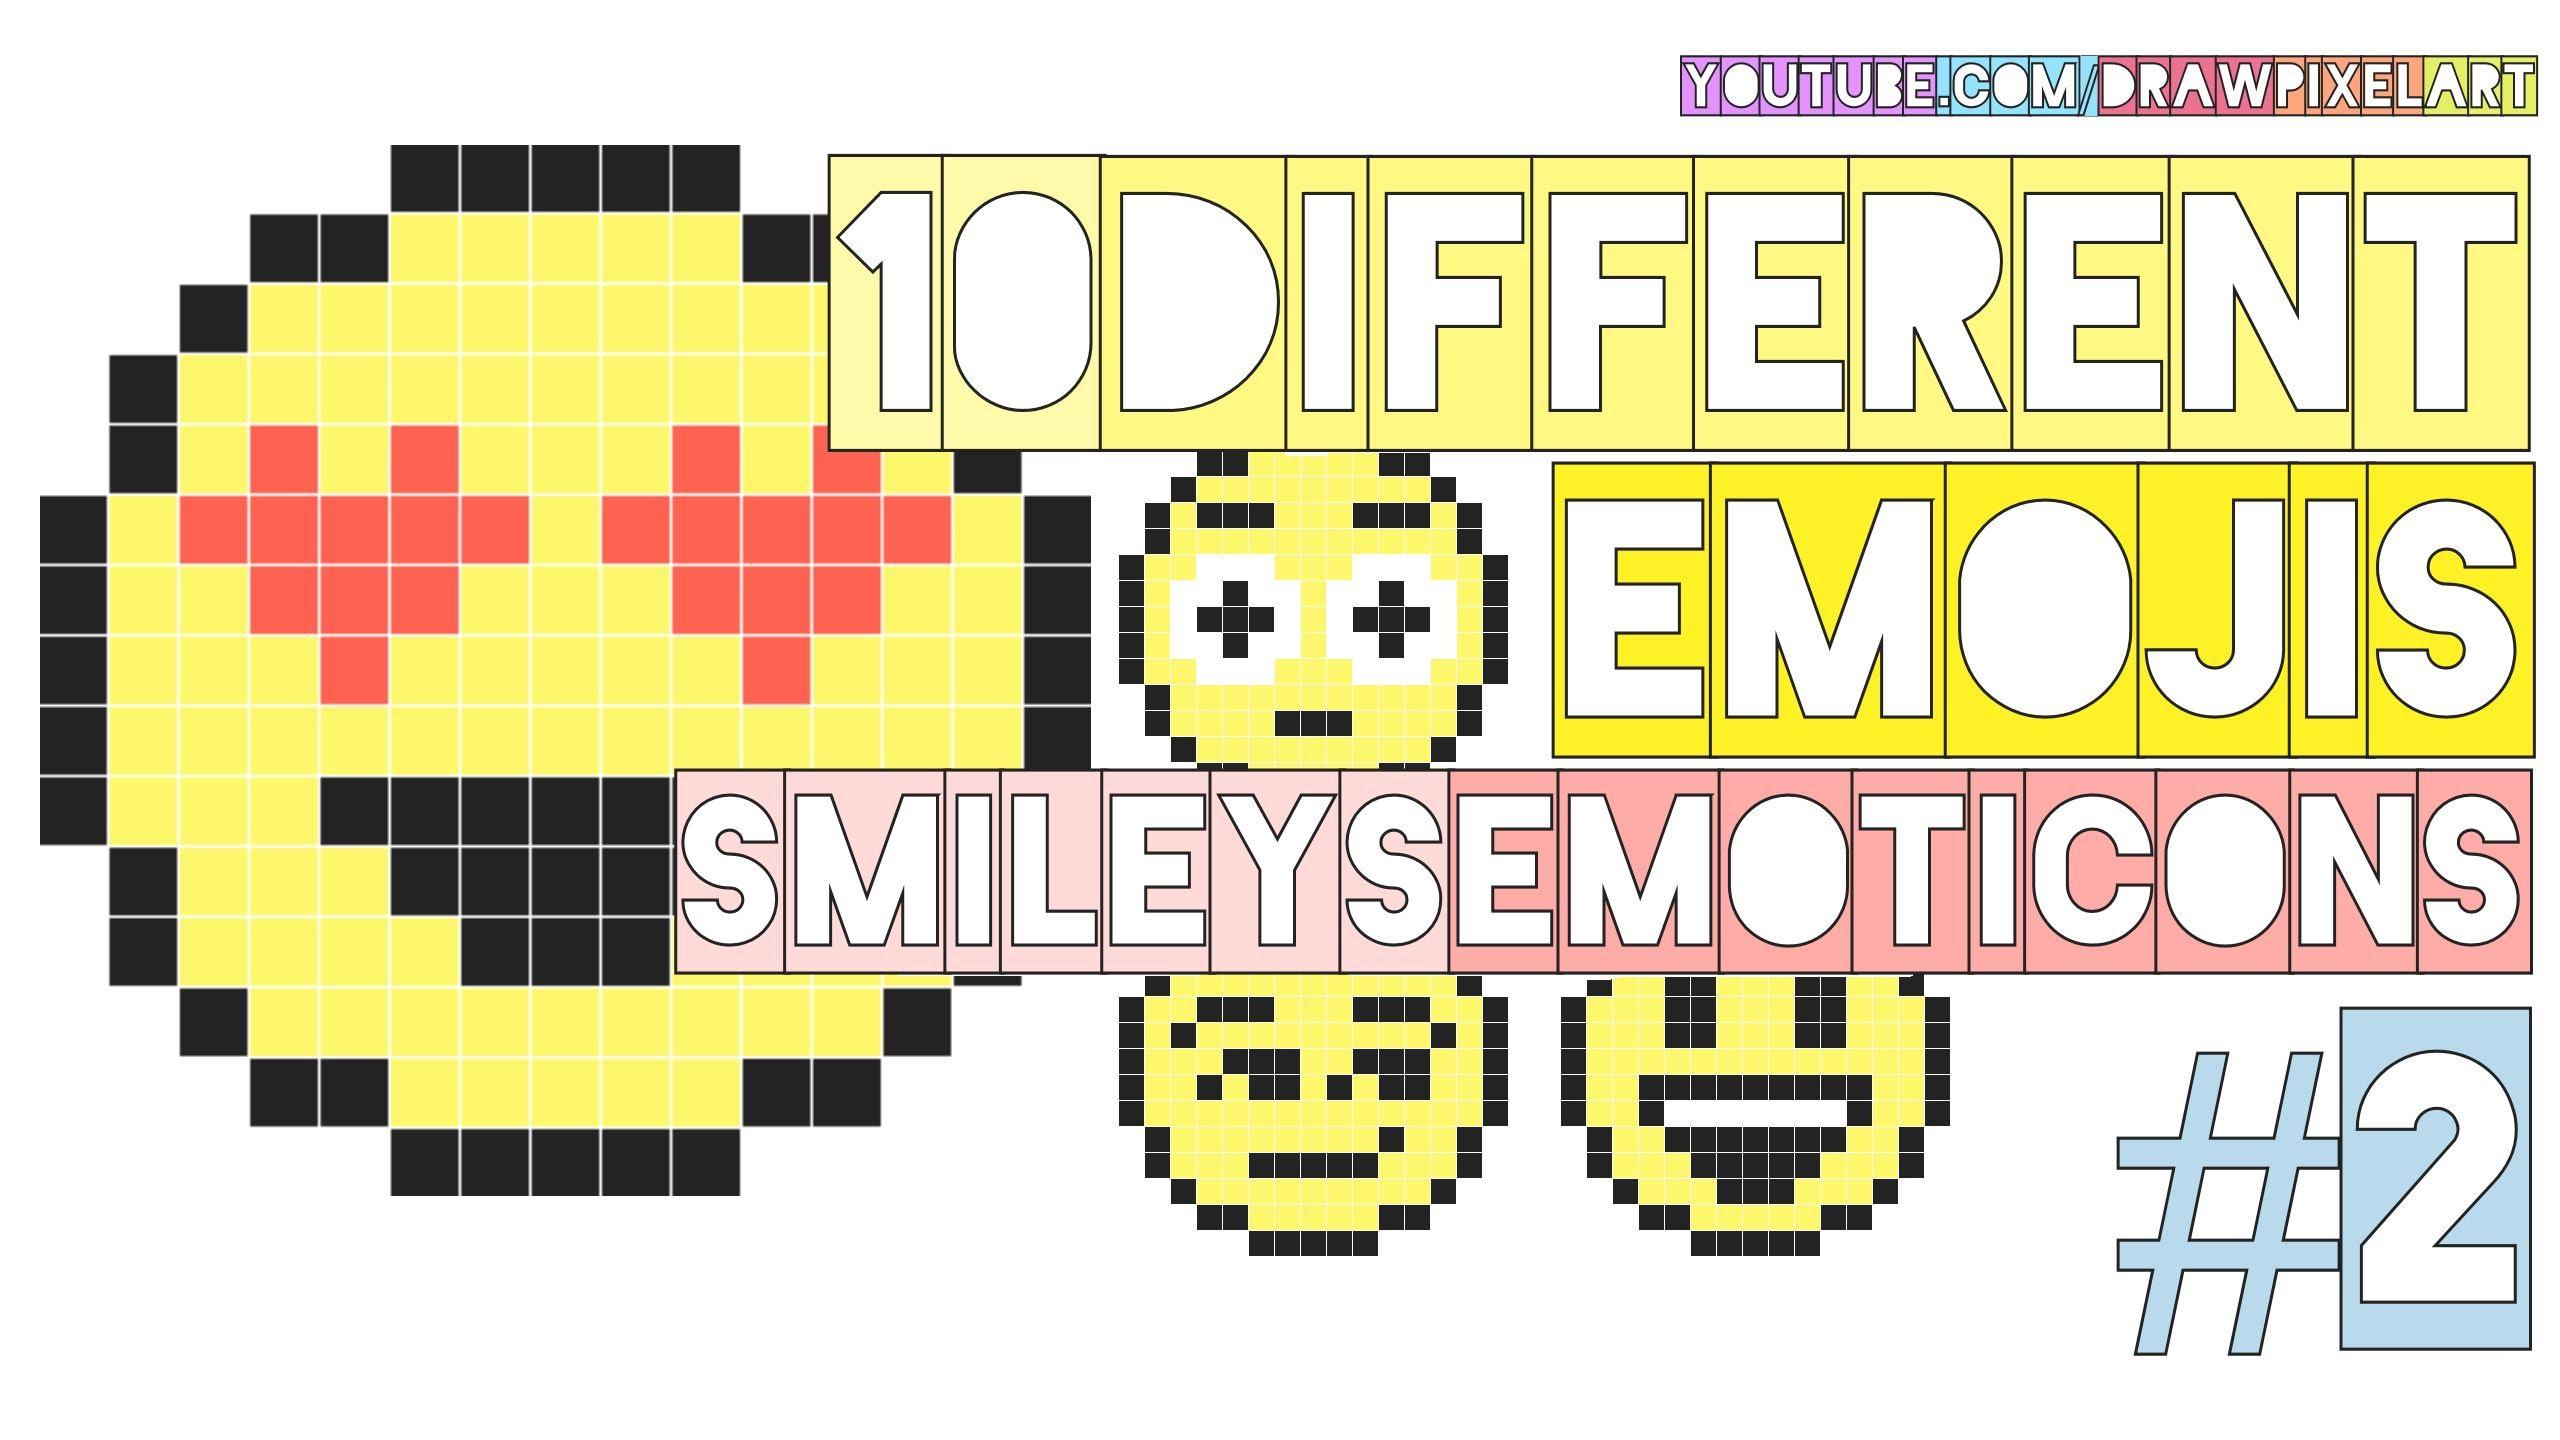 Drawn pixel art pixelated 10 emojis to emoticons different